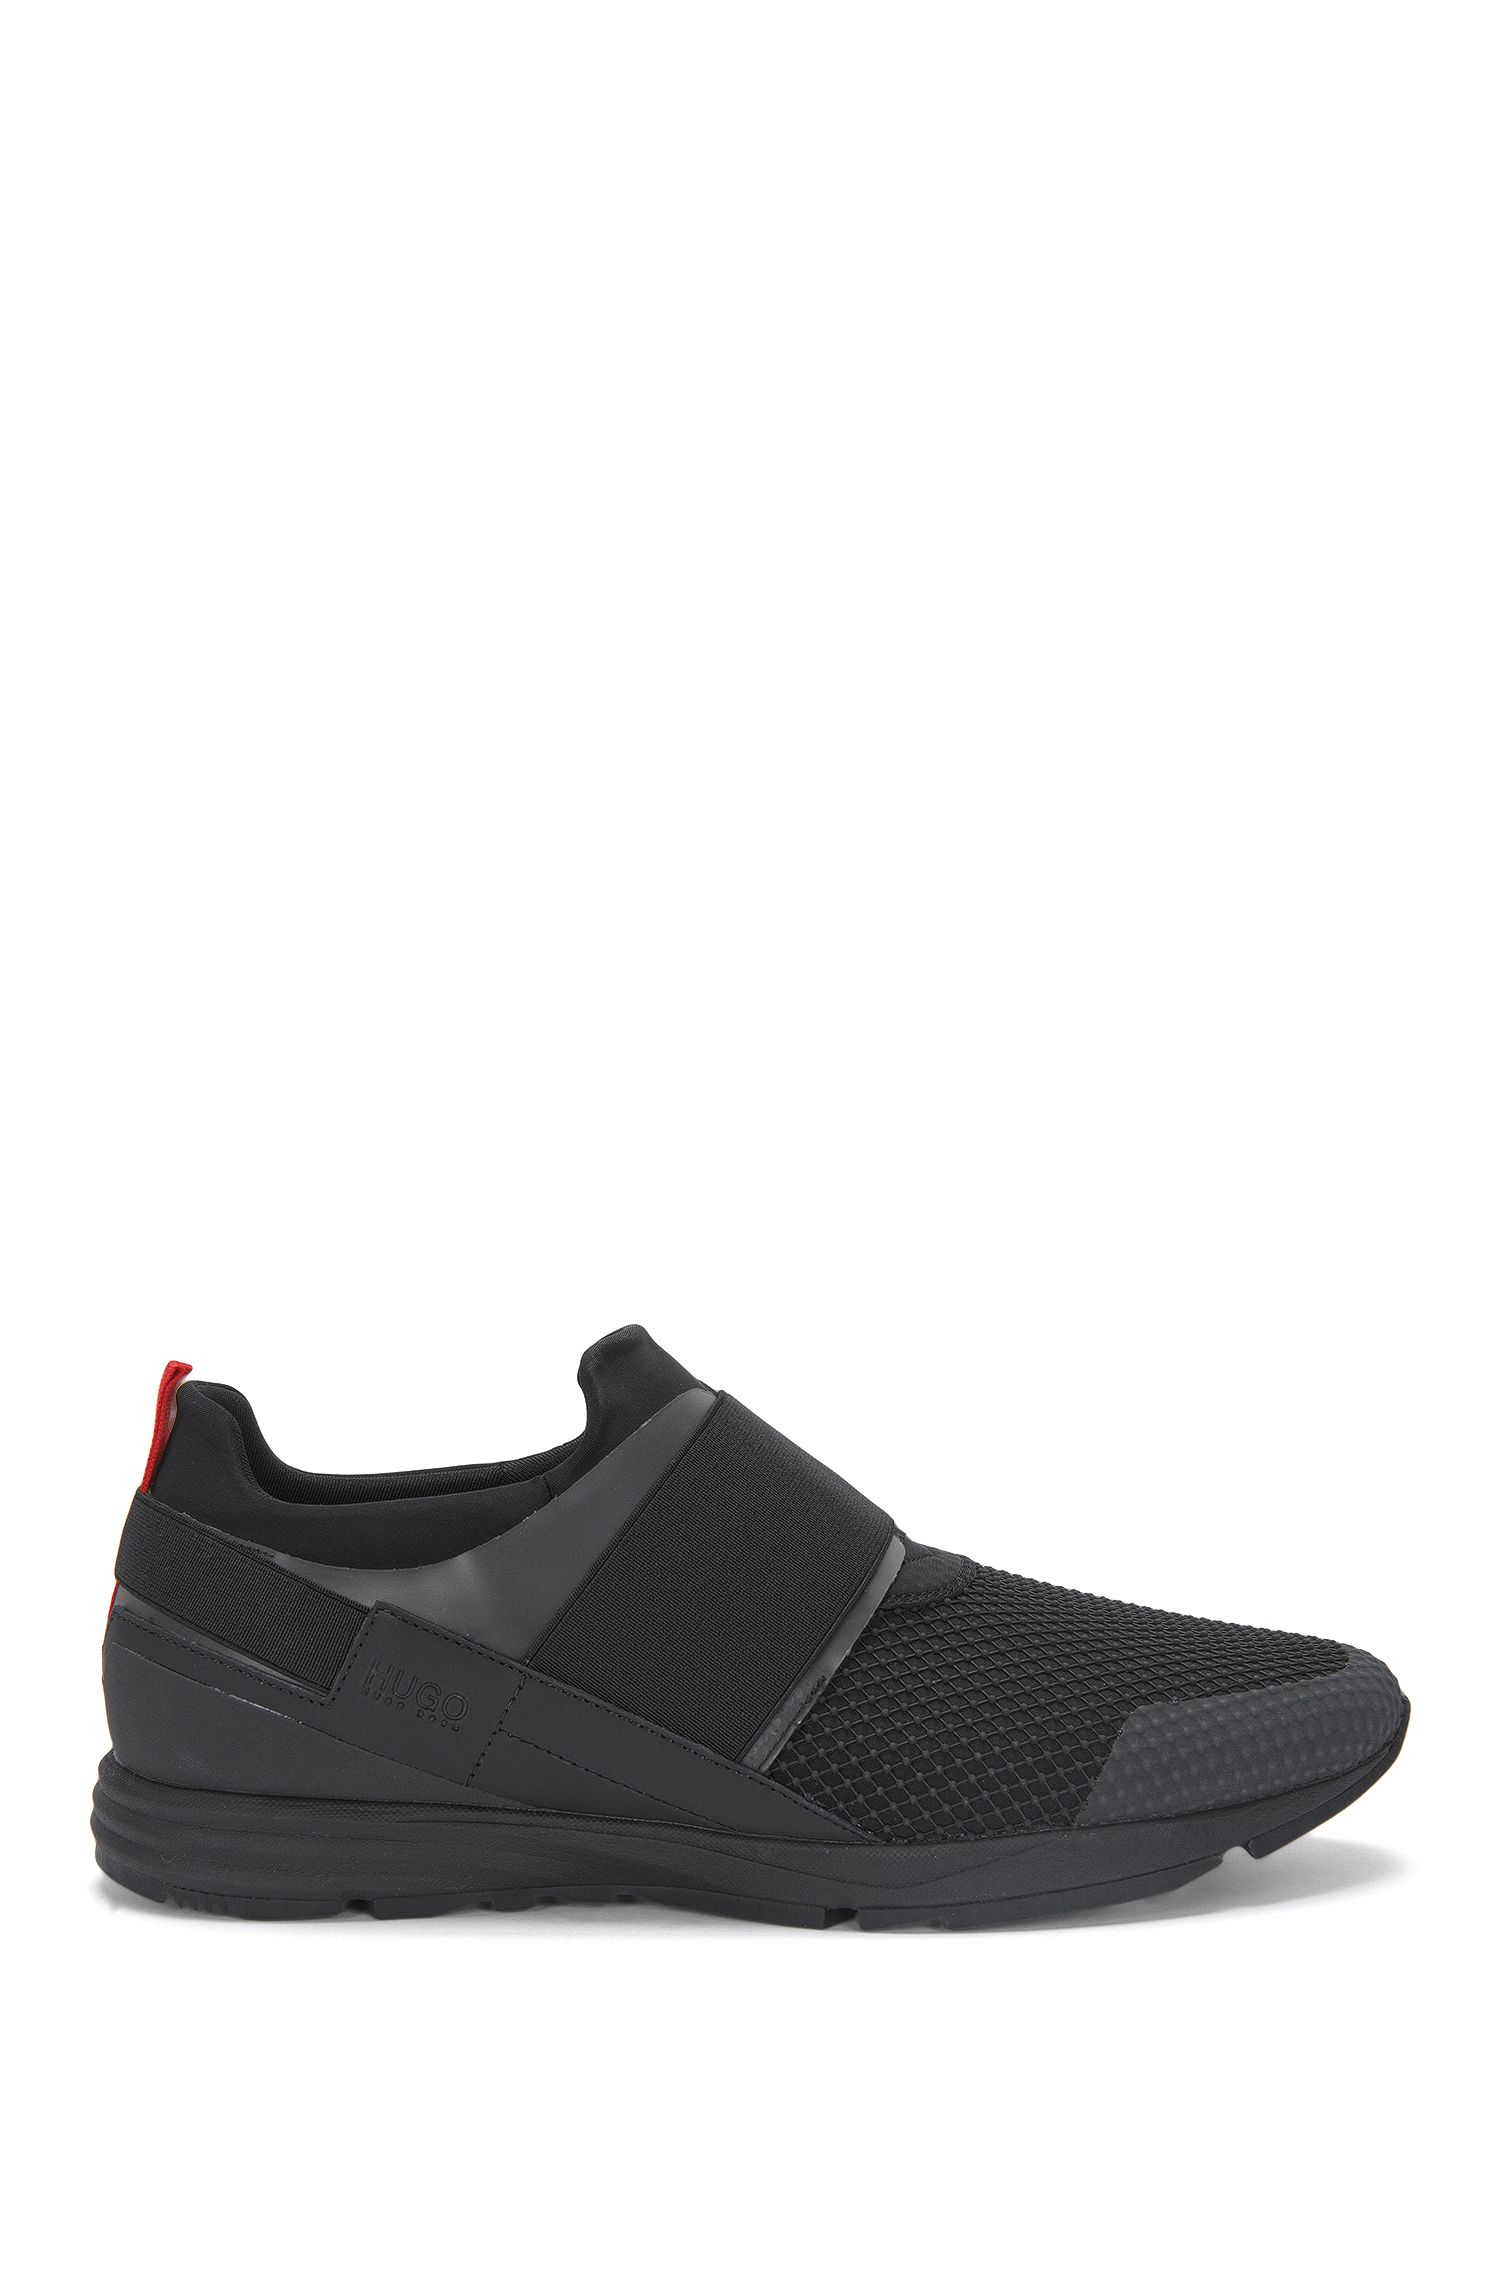 Sportive Sneakers mit Neopren-Besatz: 'Hybrid_Runn_mxnet'